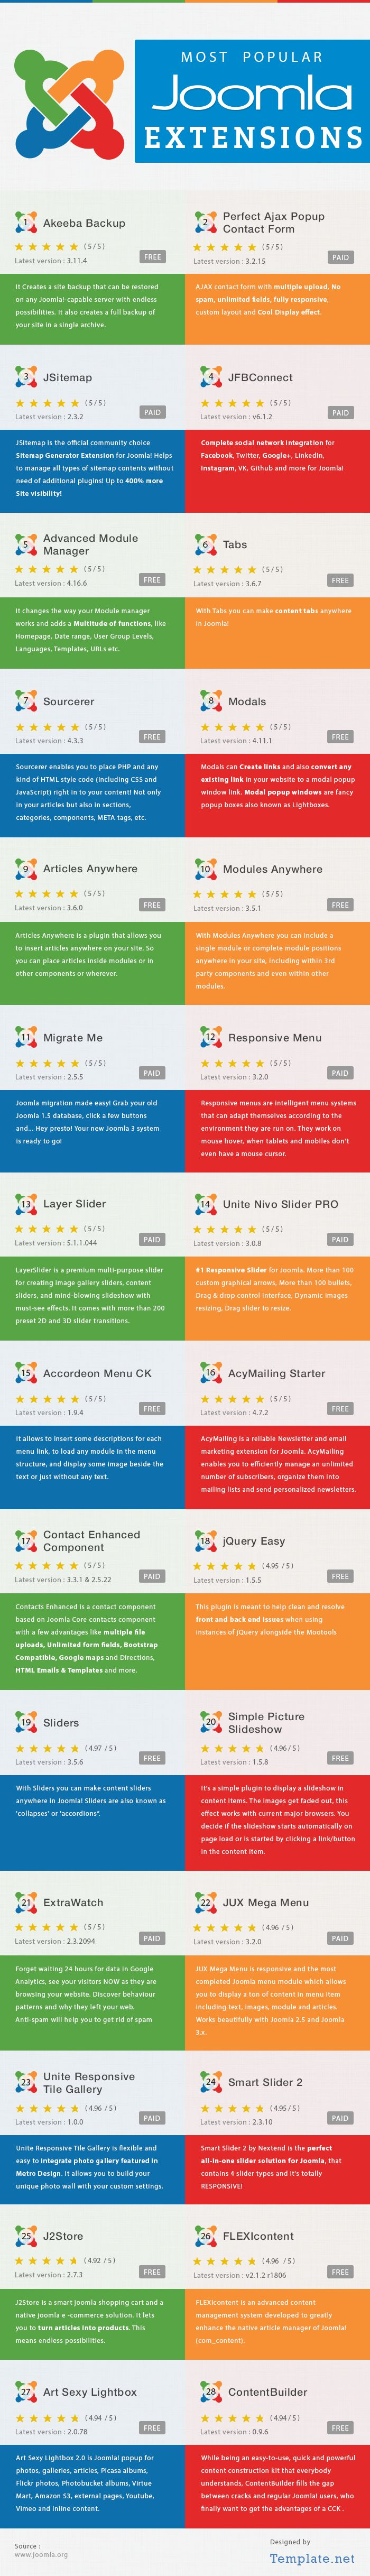 Most Popular Joomla Extensions (Infographic)Templates